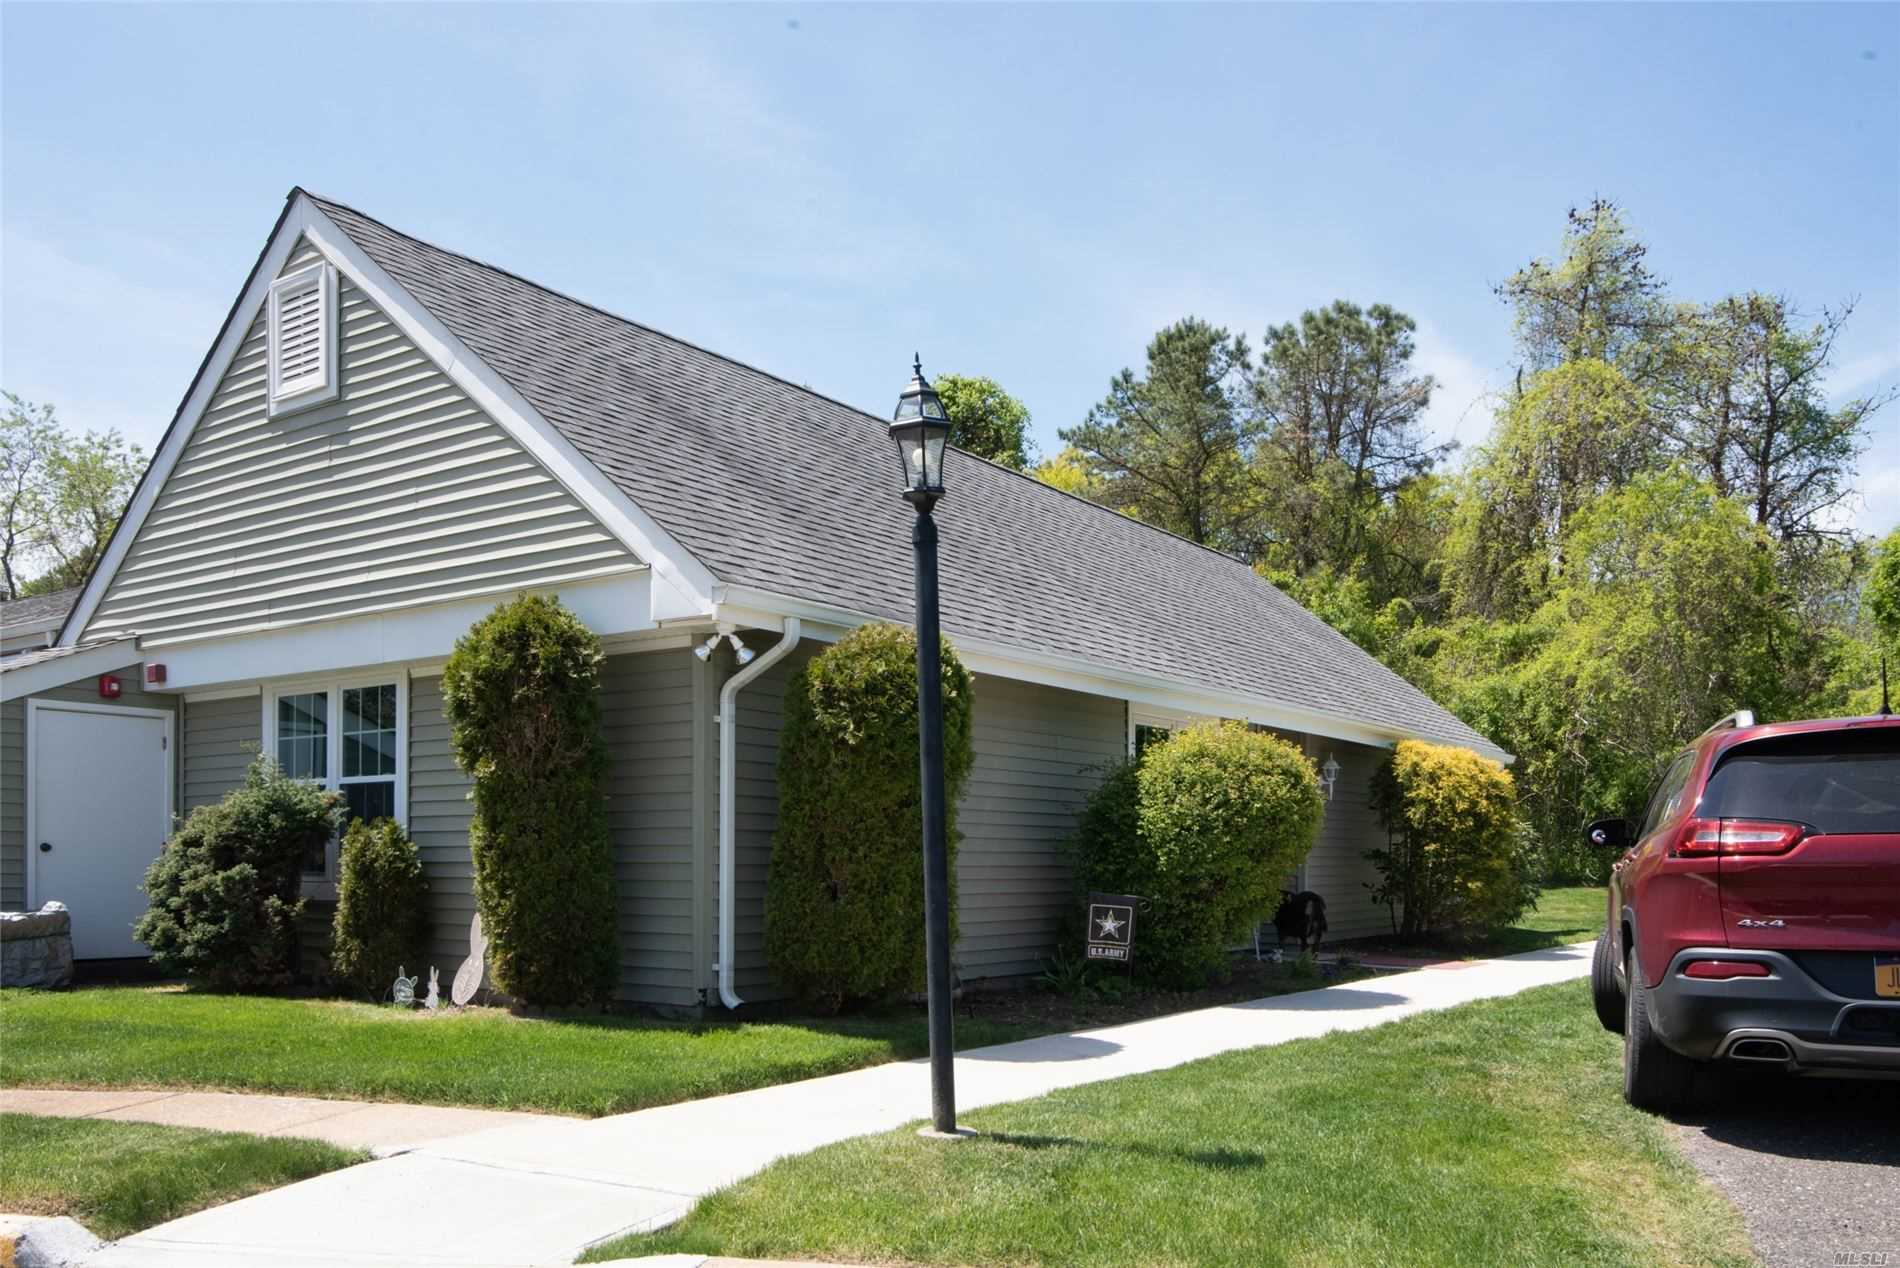 Property for sale at 428 Aylesbury Court, Ridge NY 11961, Ridge,  New York 11961